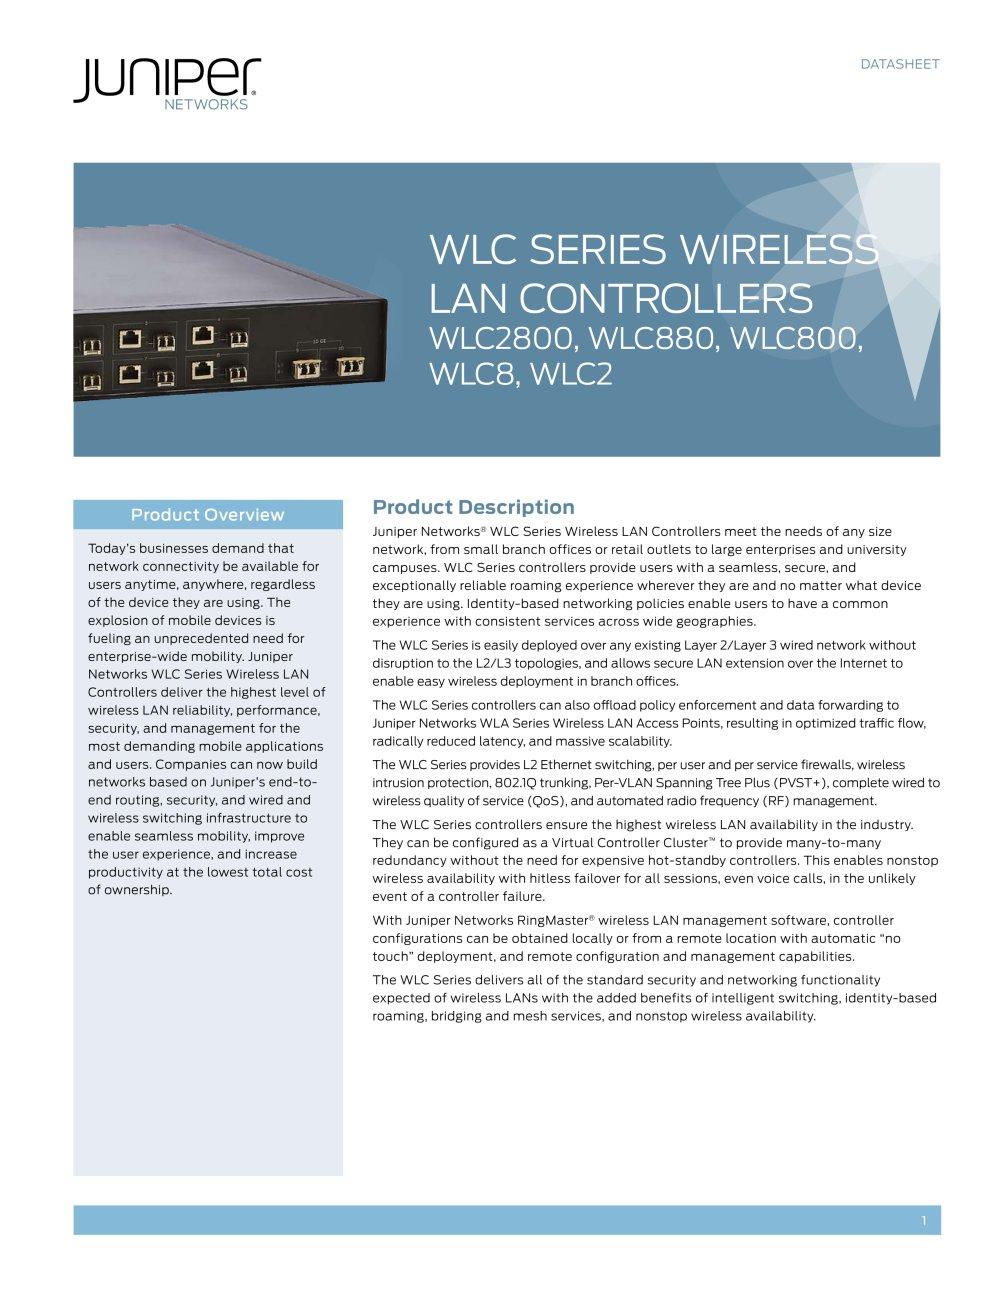 WLC Series Wireless LAN Controllers - Juniper Networks - PDF ...